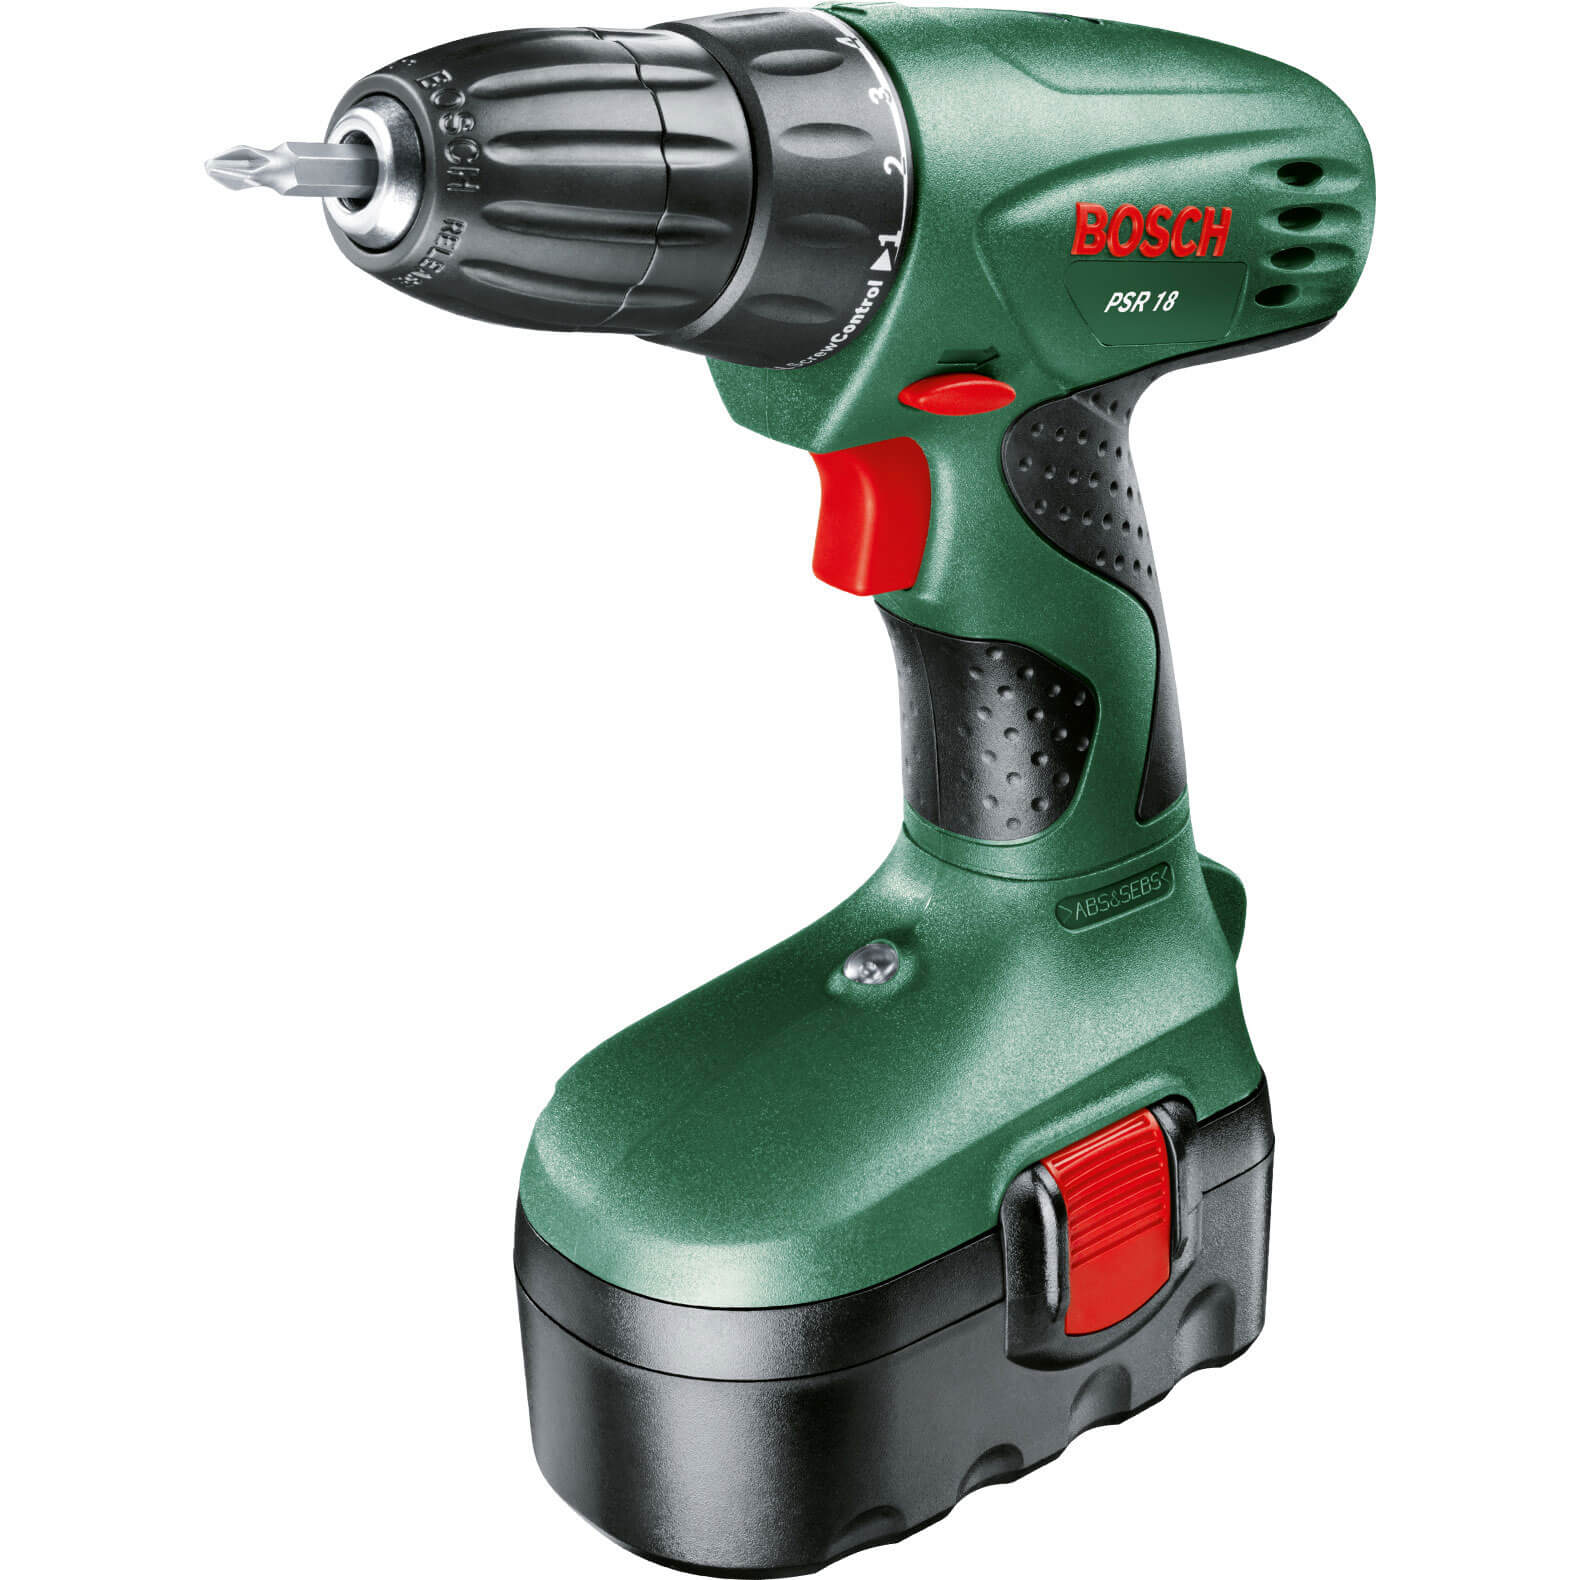 Bosch PSR 18v Cordless Drill Driver 2 x 1.2ah NiCD Charger Case